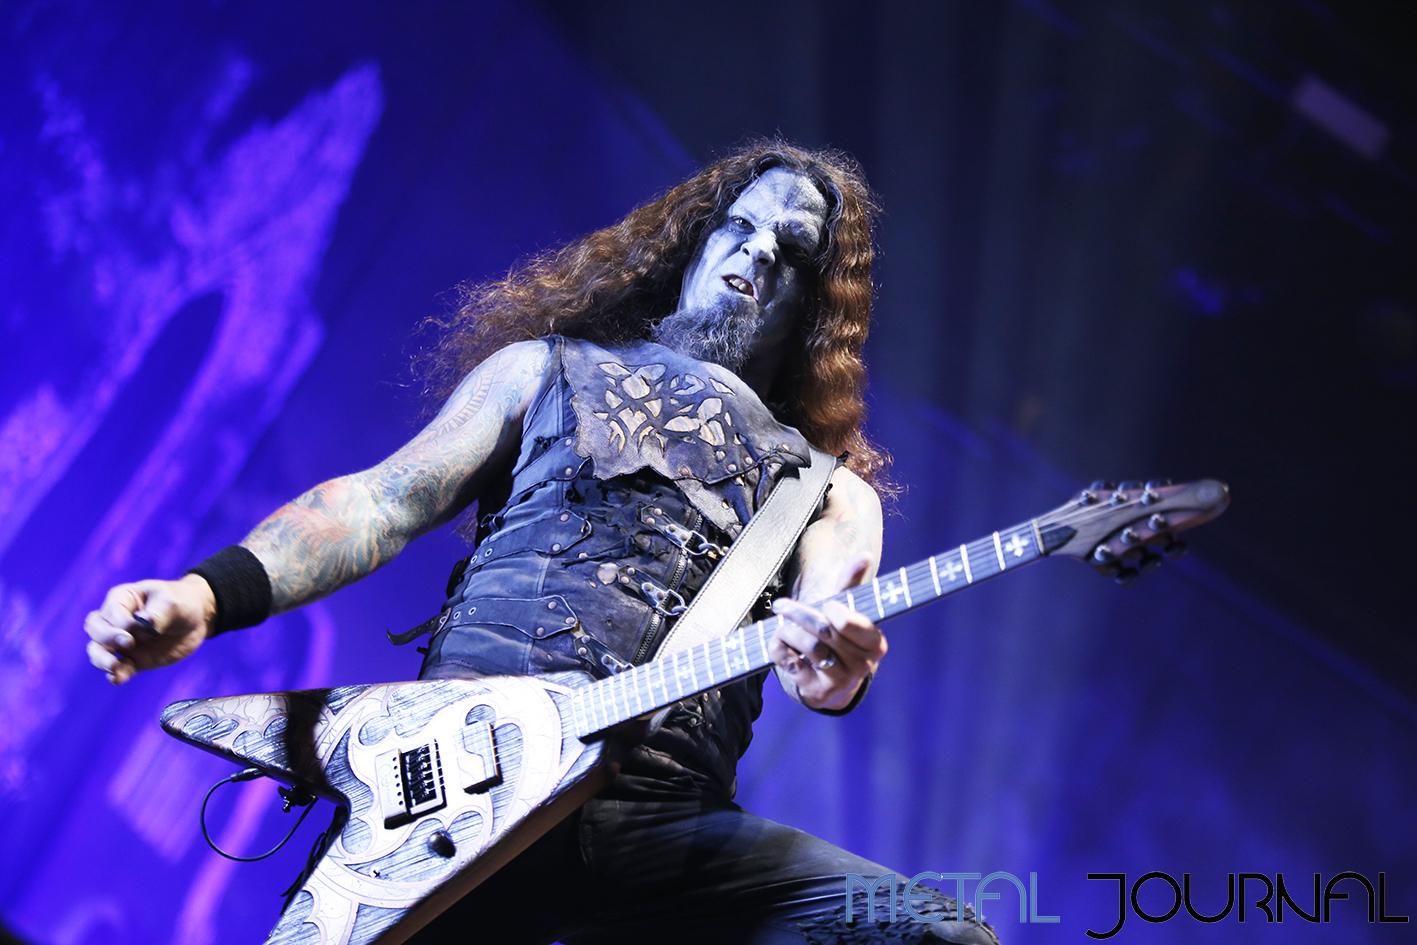 powerwolf - metal journal rock fest barcelona 2019 pic 8